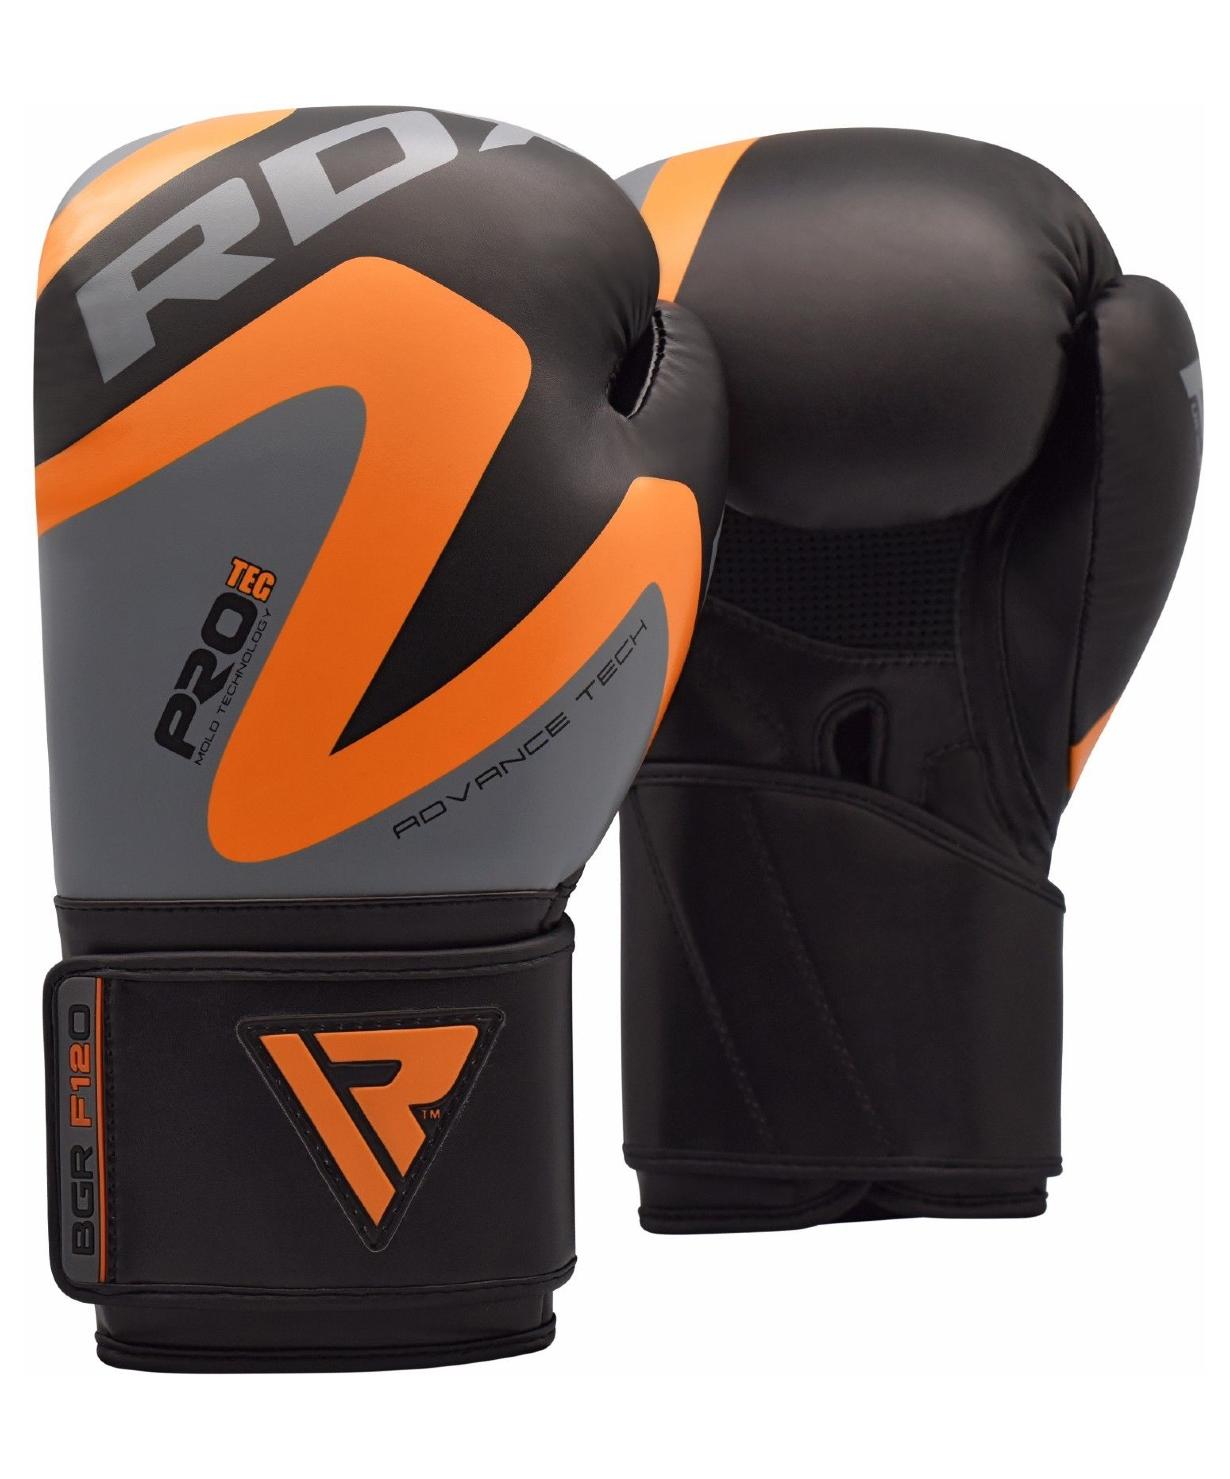 Перчатки Перчатки боксерские RDX REX 12 oz 65949b6fd8184eac96808312591053b4.png